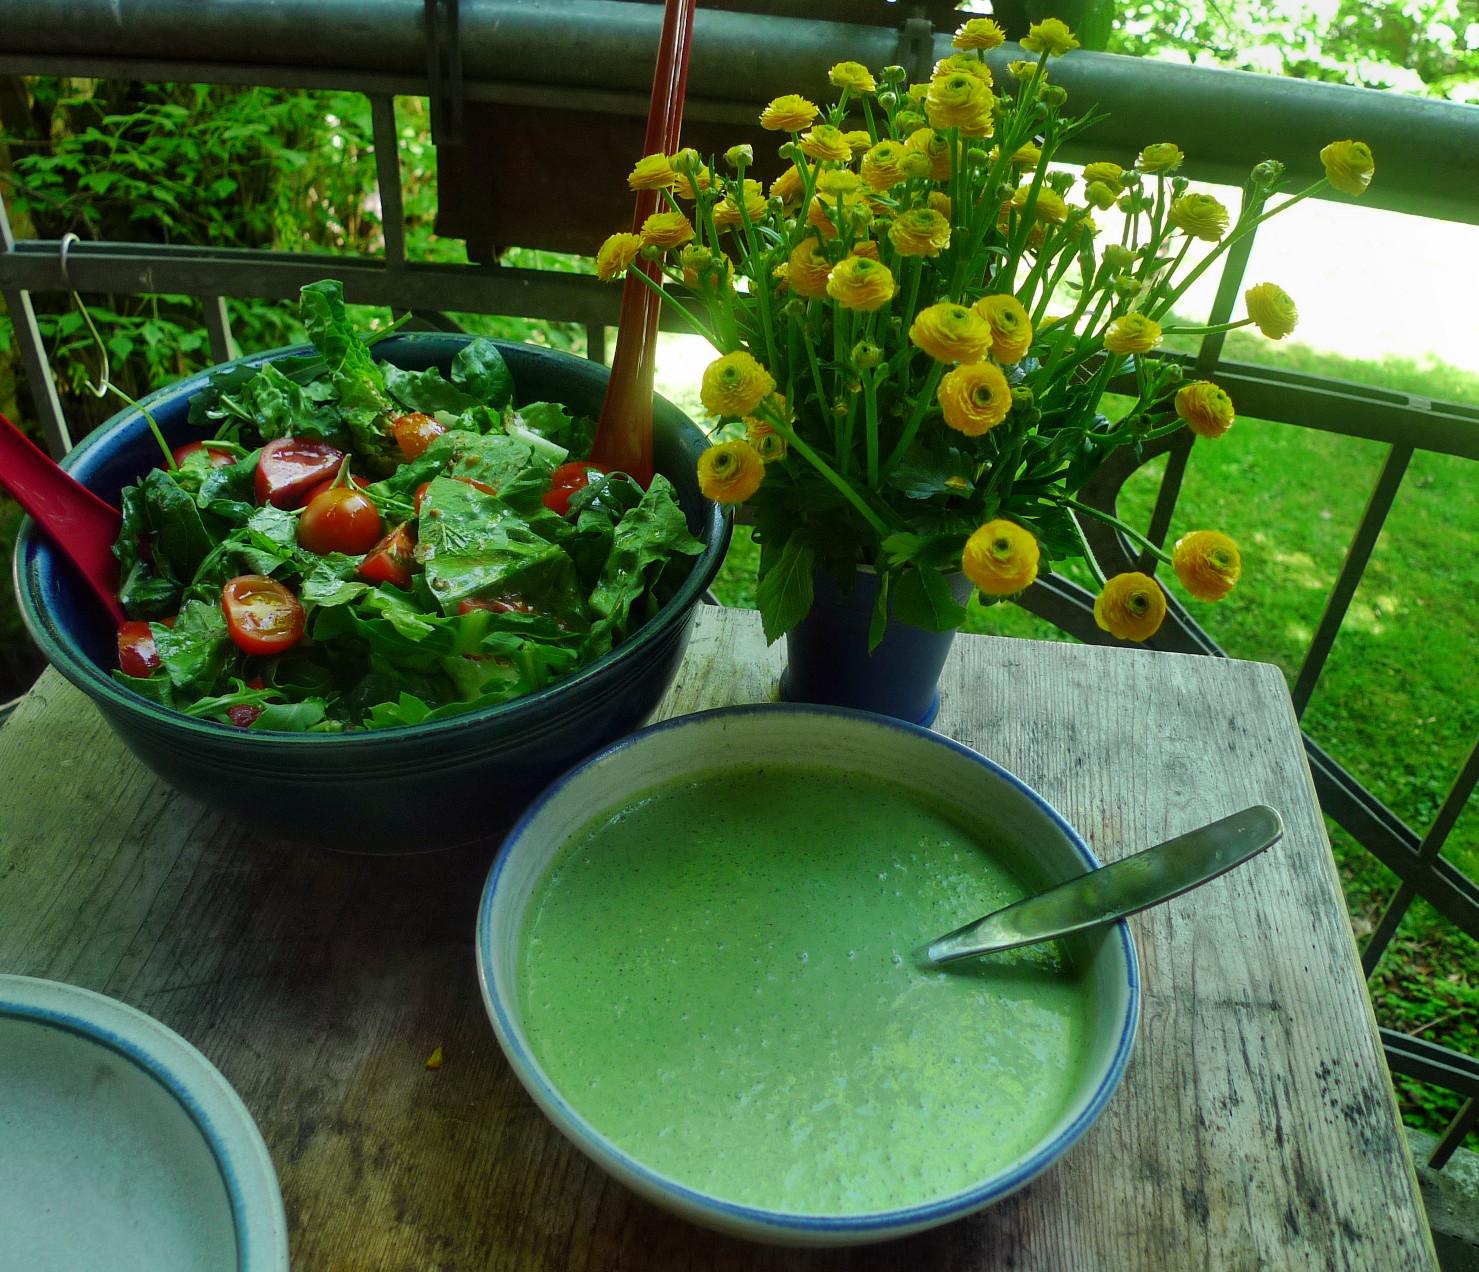 Lachs,Spargel,Dip,Salat,Kartoffel -10.5.15   (7)